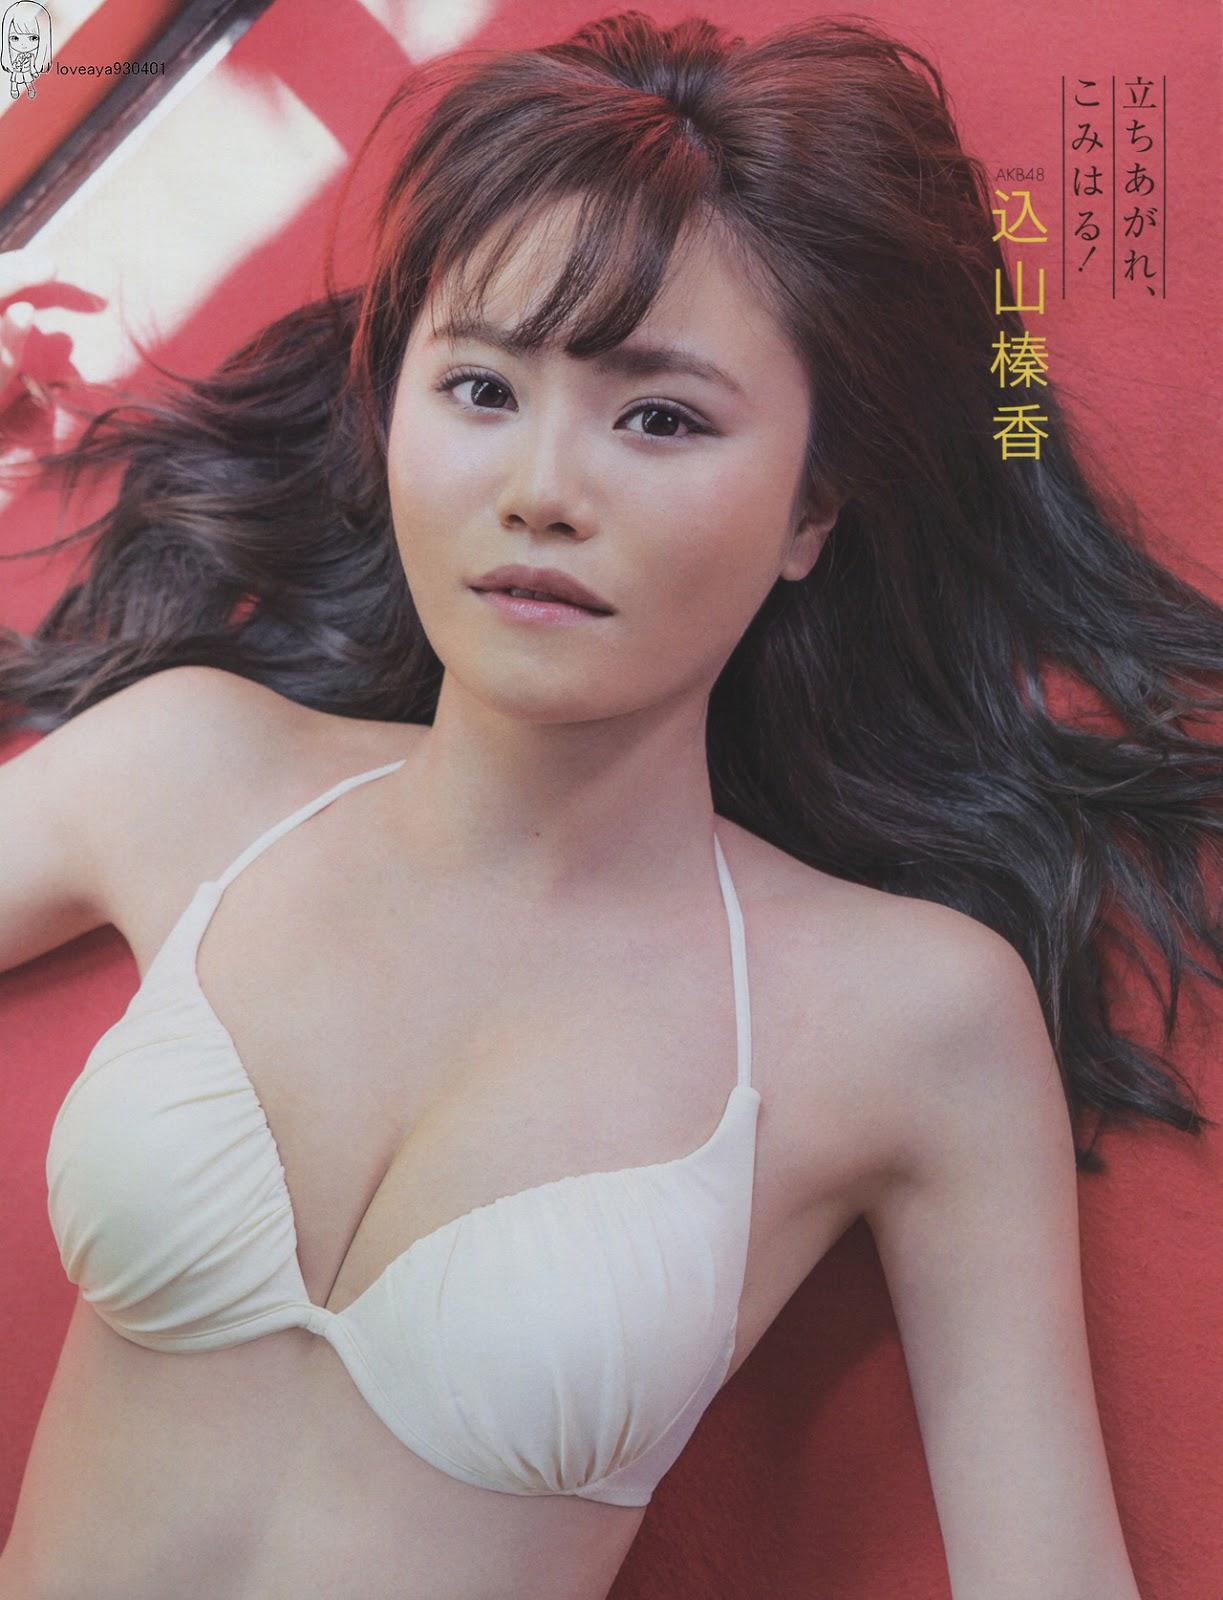 Komiyama Haruka 込山榛香 AKB48, Ex-Taishu 2017.07 (EX大衆 2017年07月号)